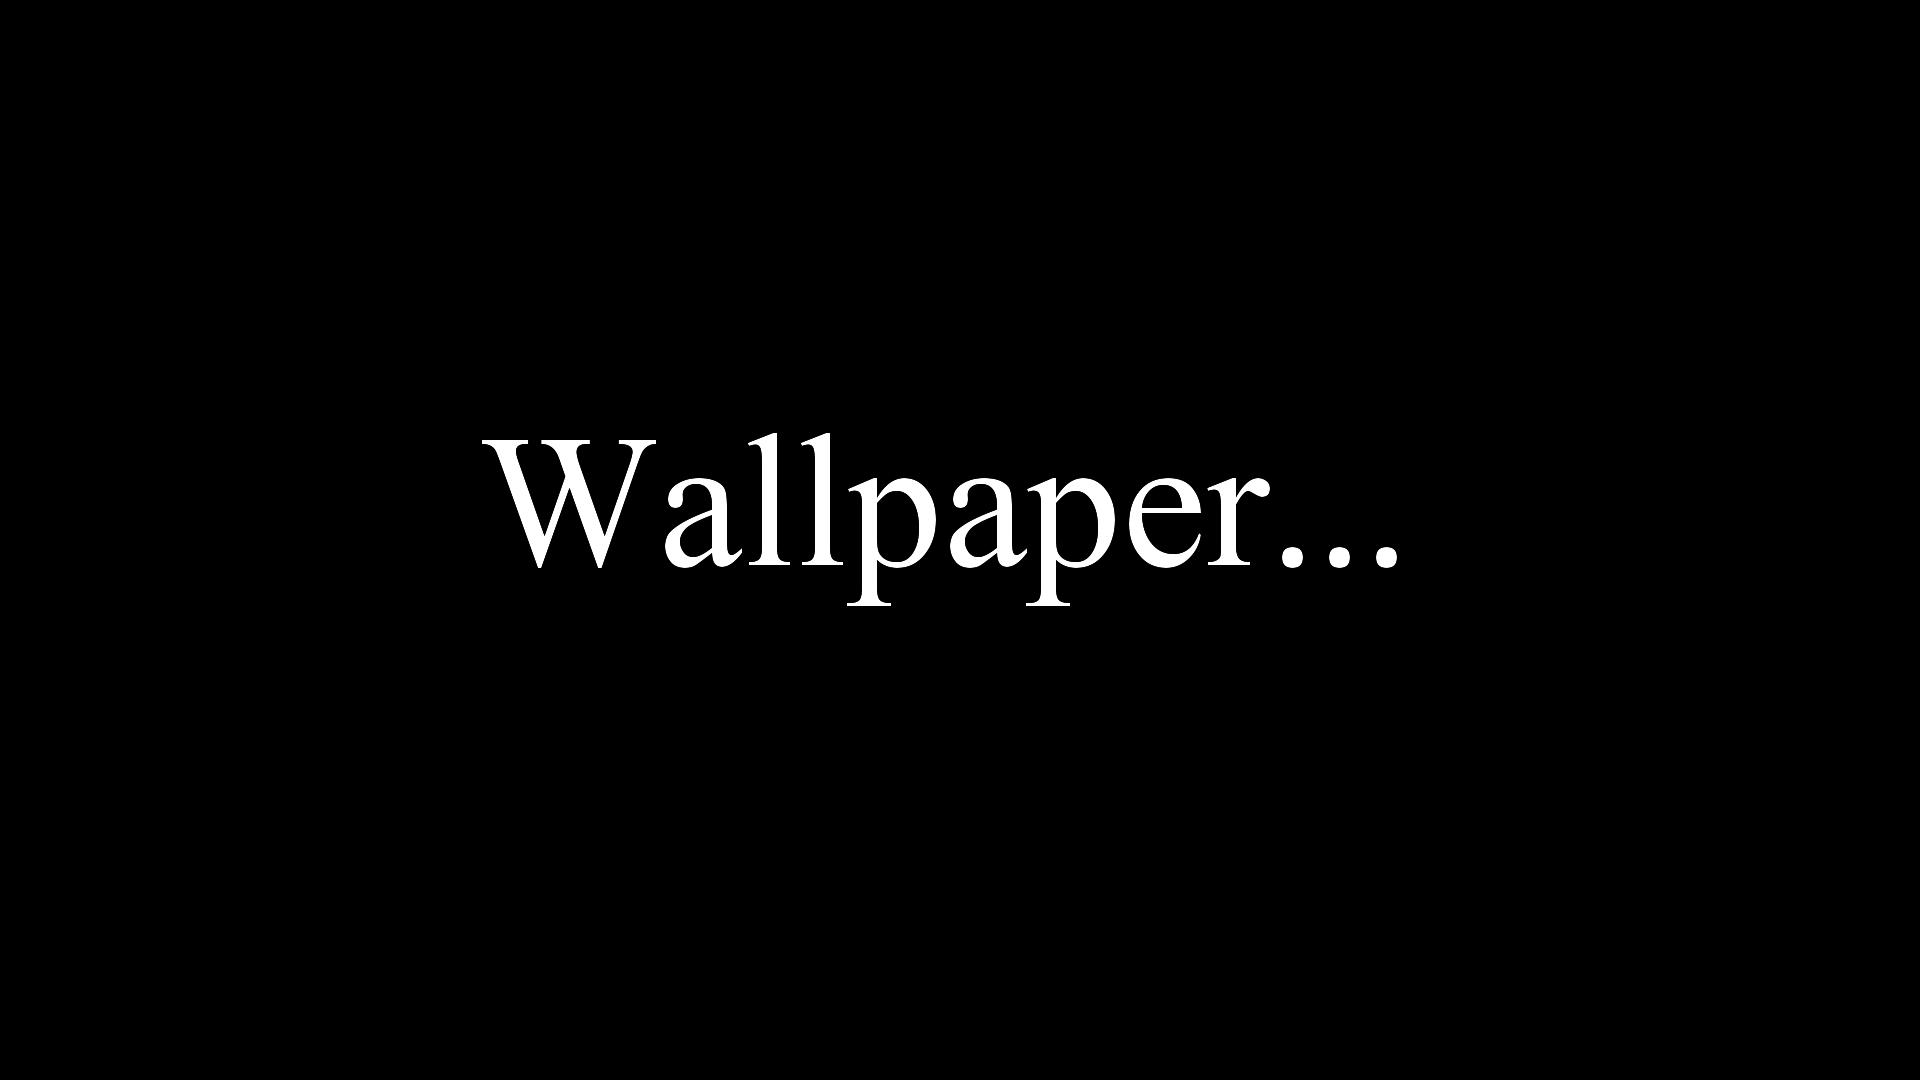 3 words hd wallpapers